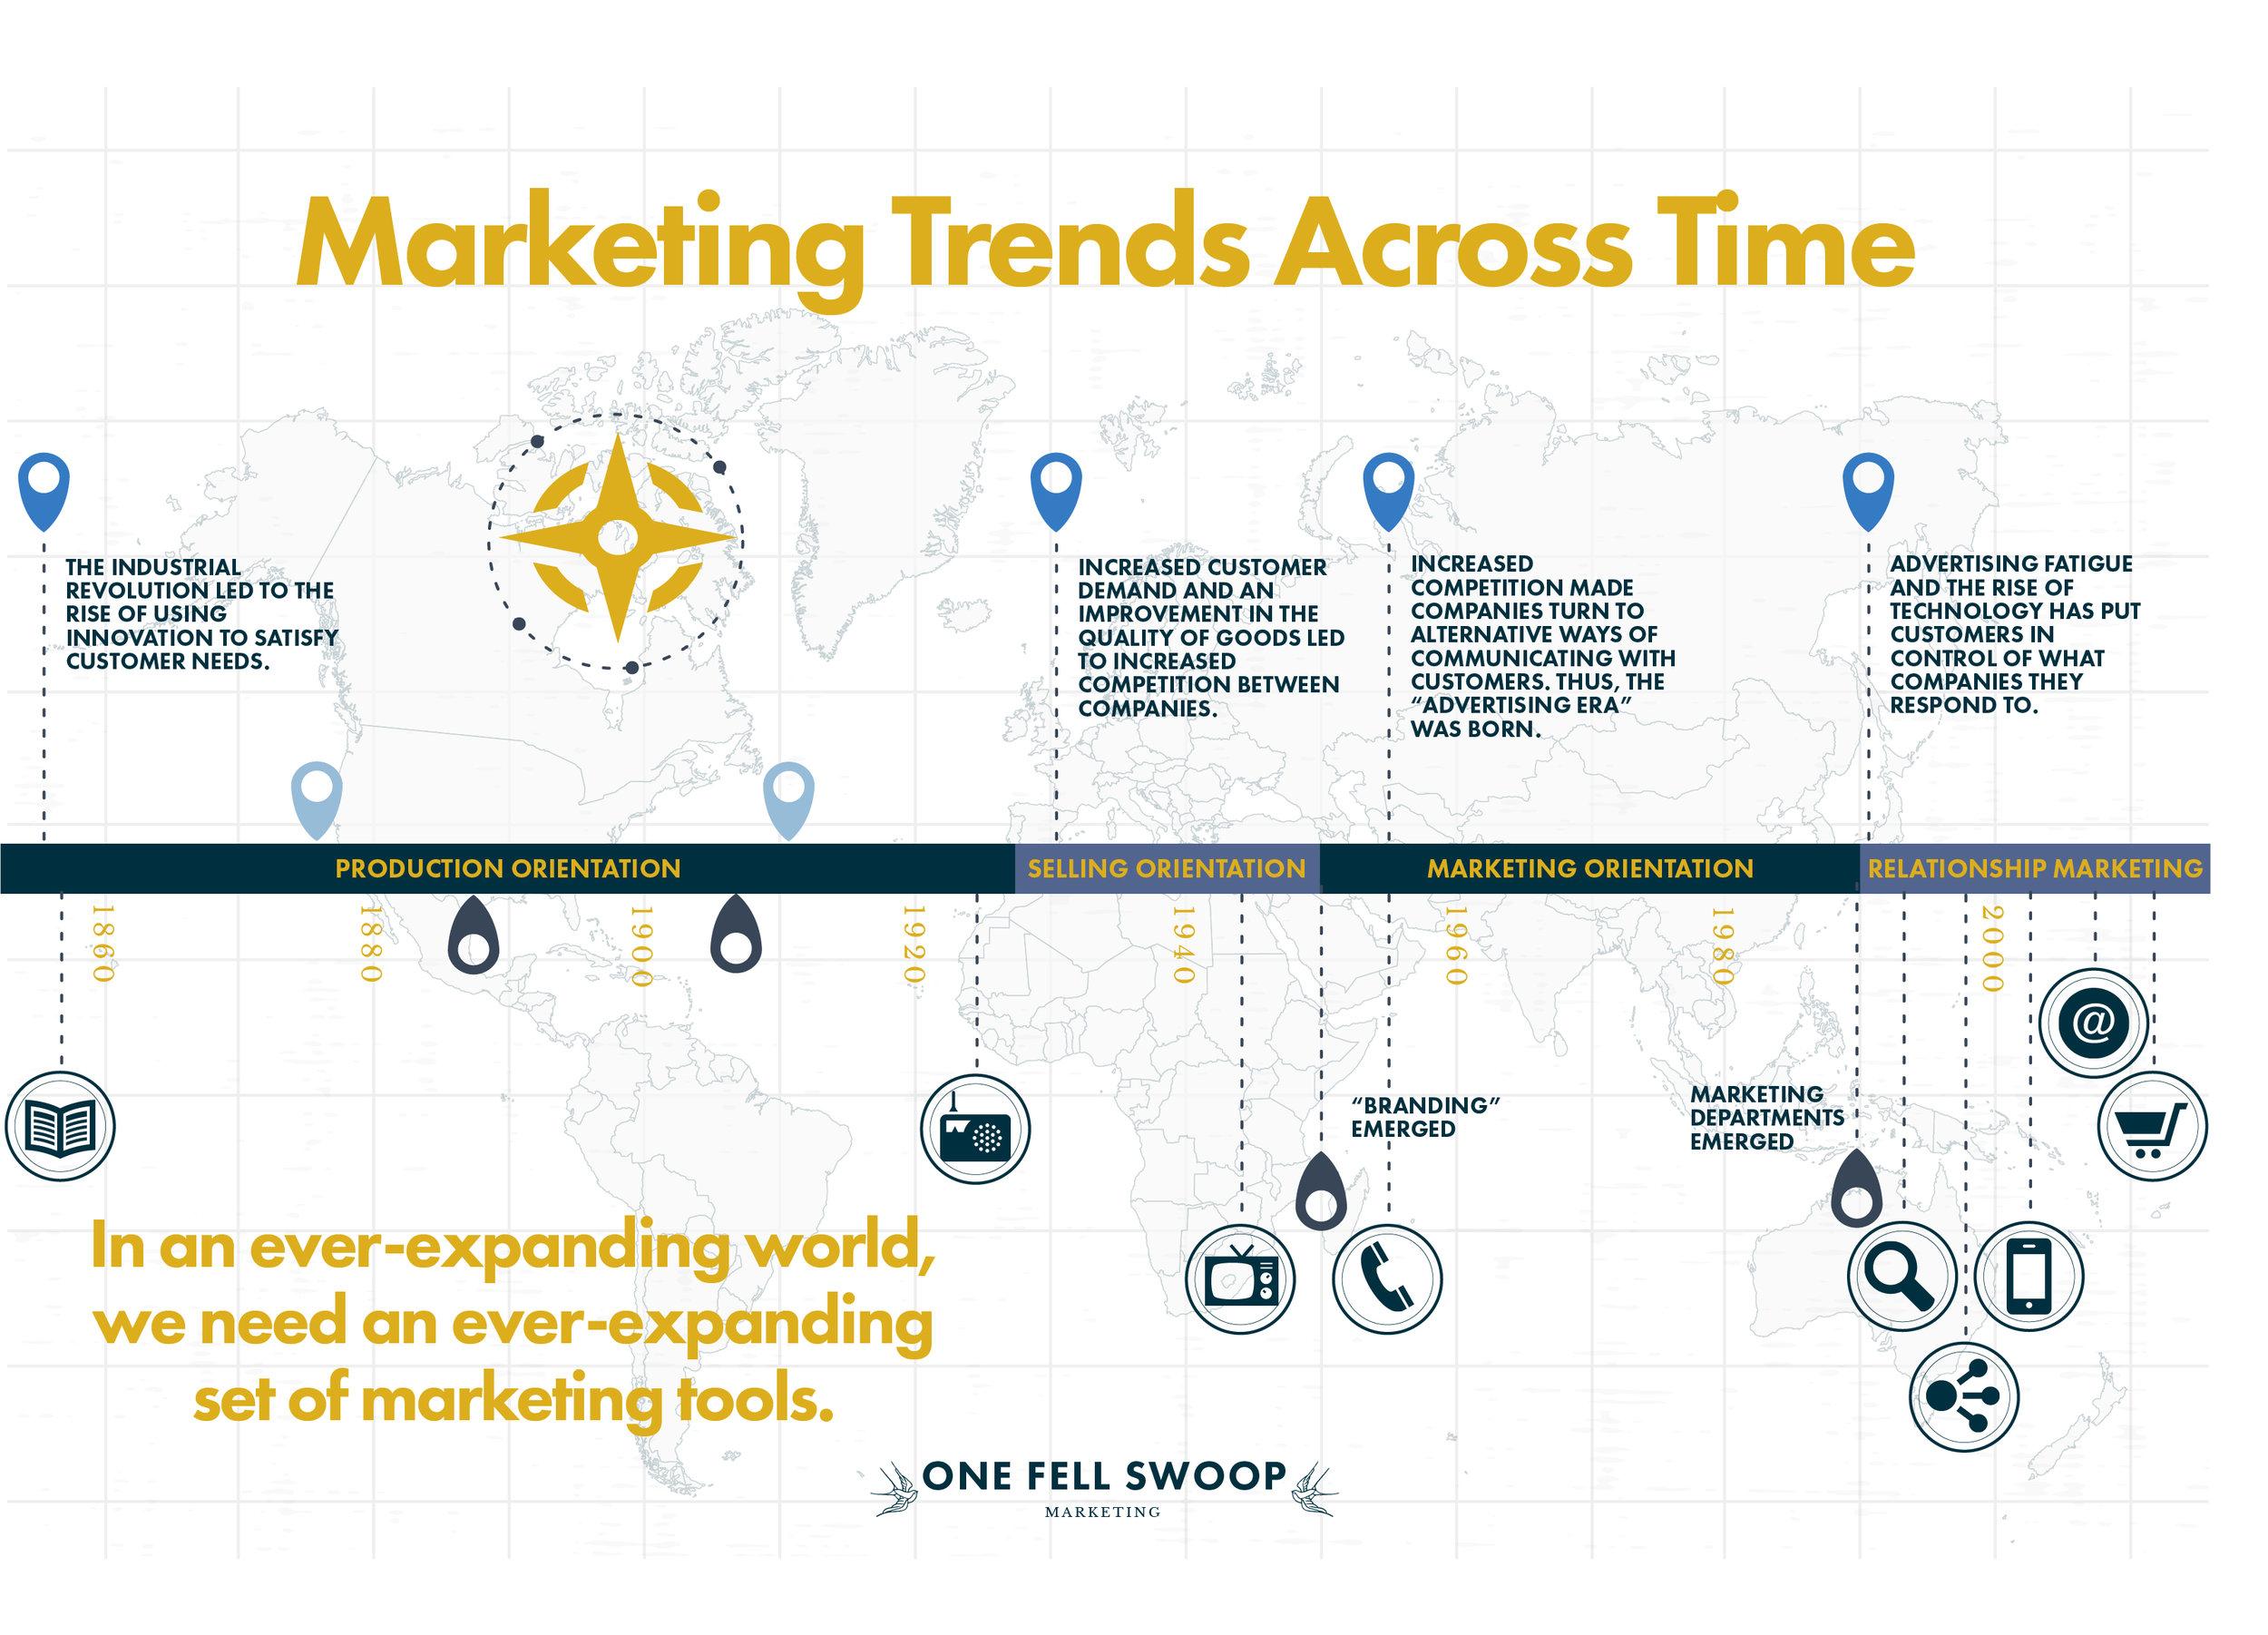 Marketing Trends Across Time Infographic.jpg